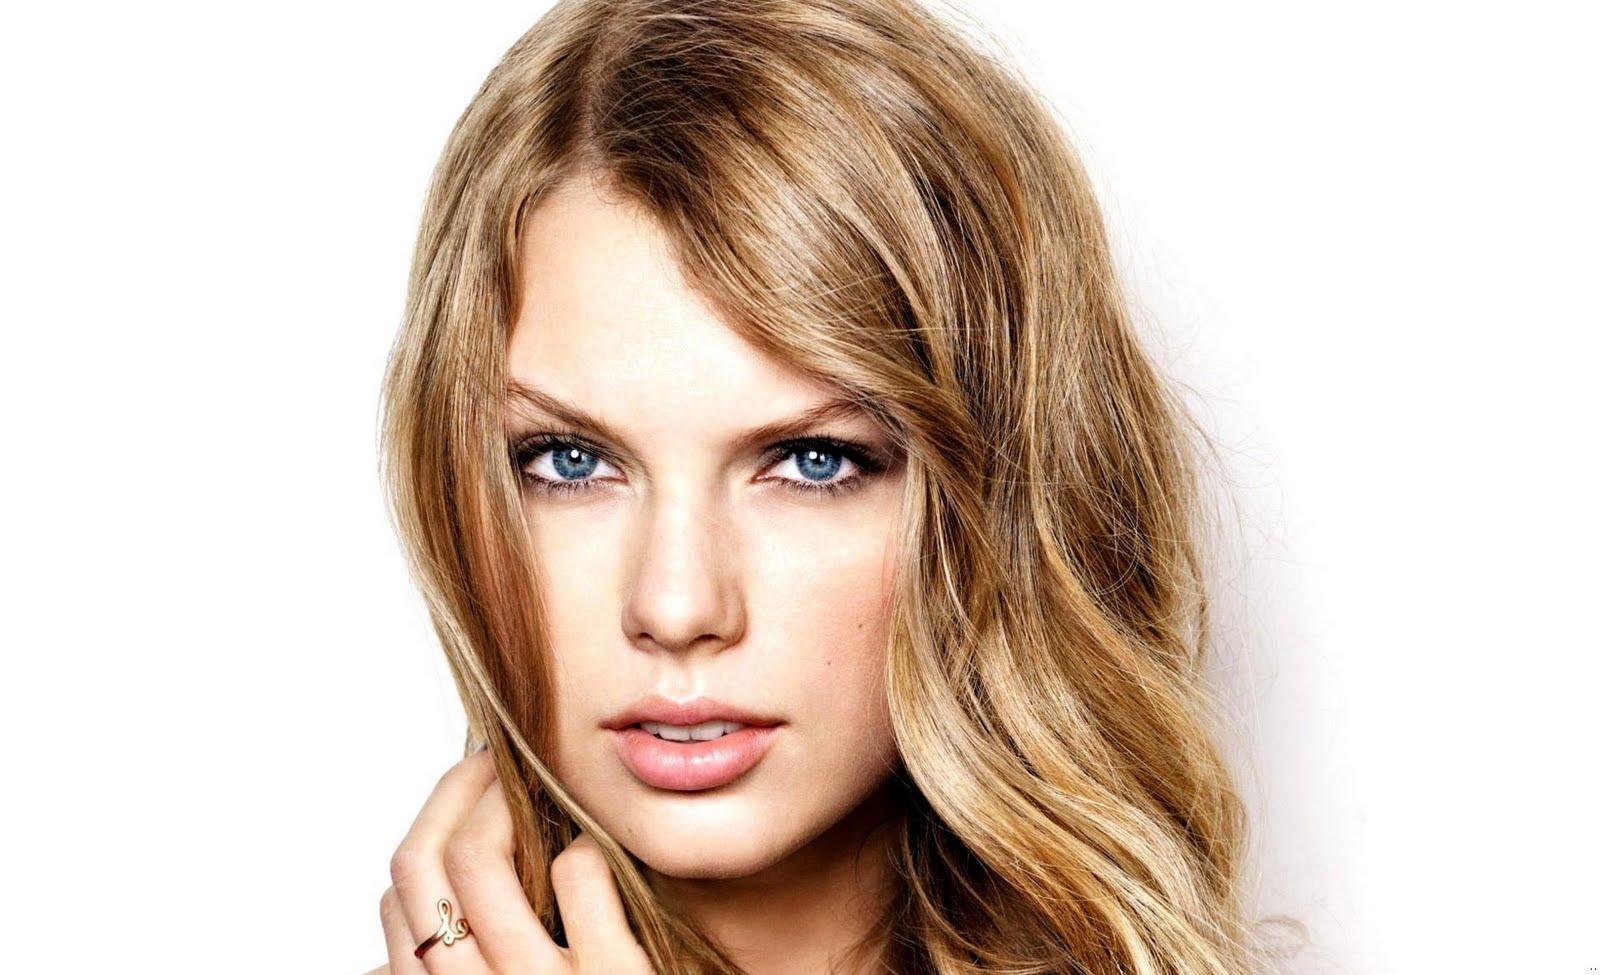 http://3.bp.blogspot.com/-FjdVzdCDbac/TwmmGp99jYI/AAAAAAAANDY/GlJ3BjXLciE/s1600/Taylor_Swift_BILLBORD_HITS_SINGER_WALLPAPERS.jpg